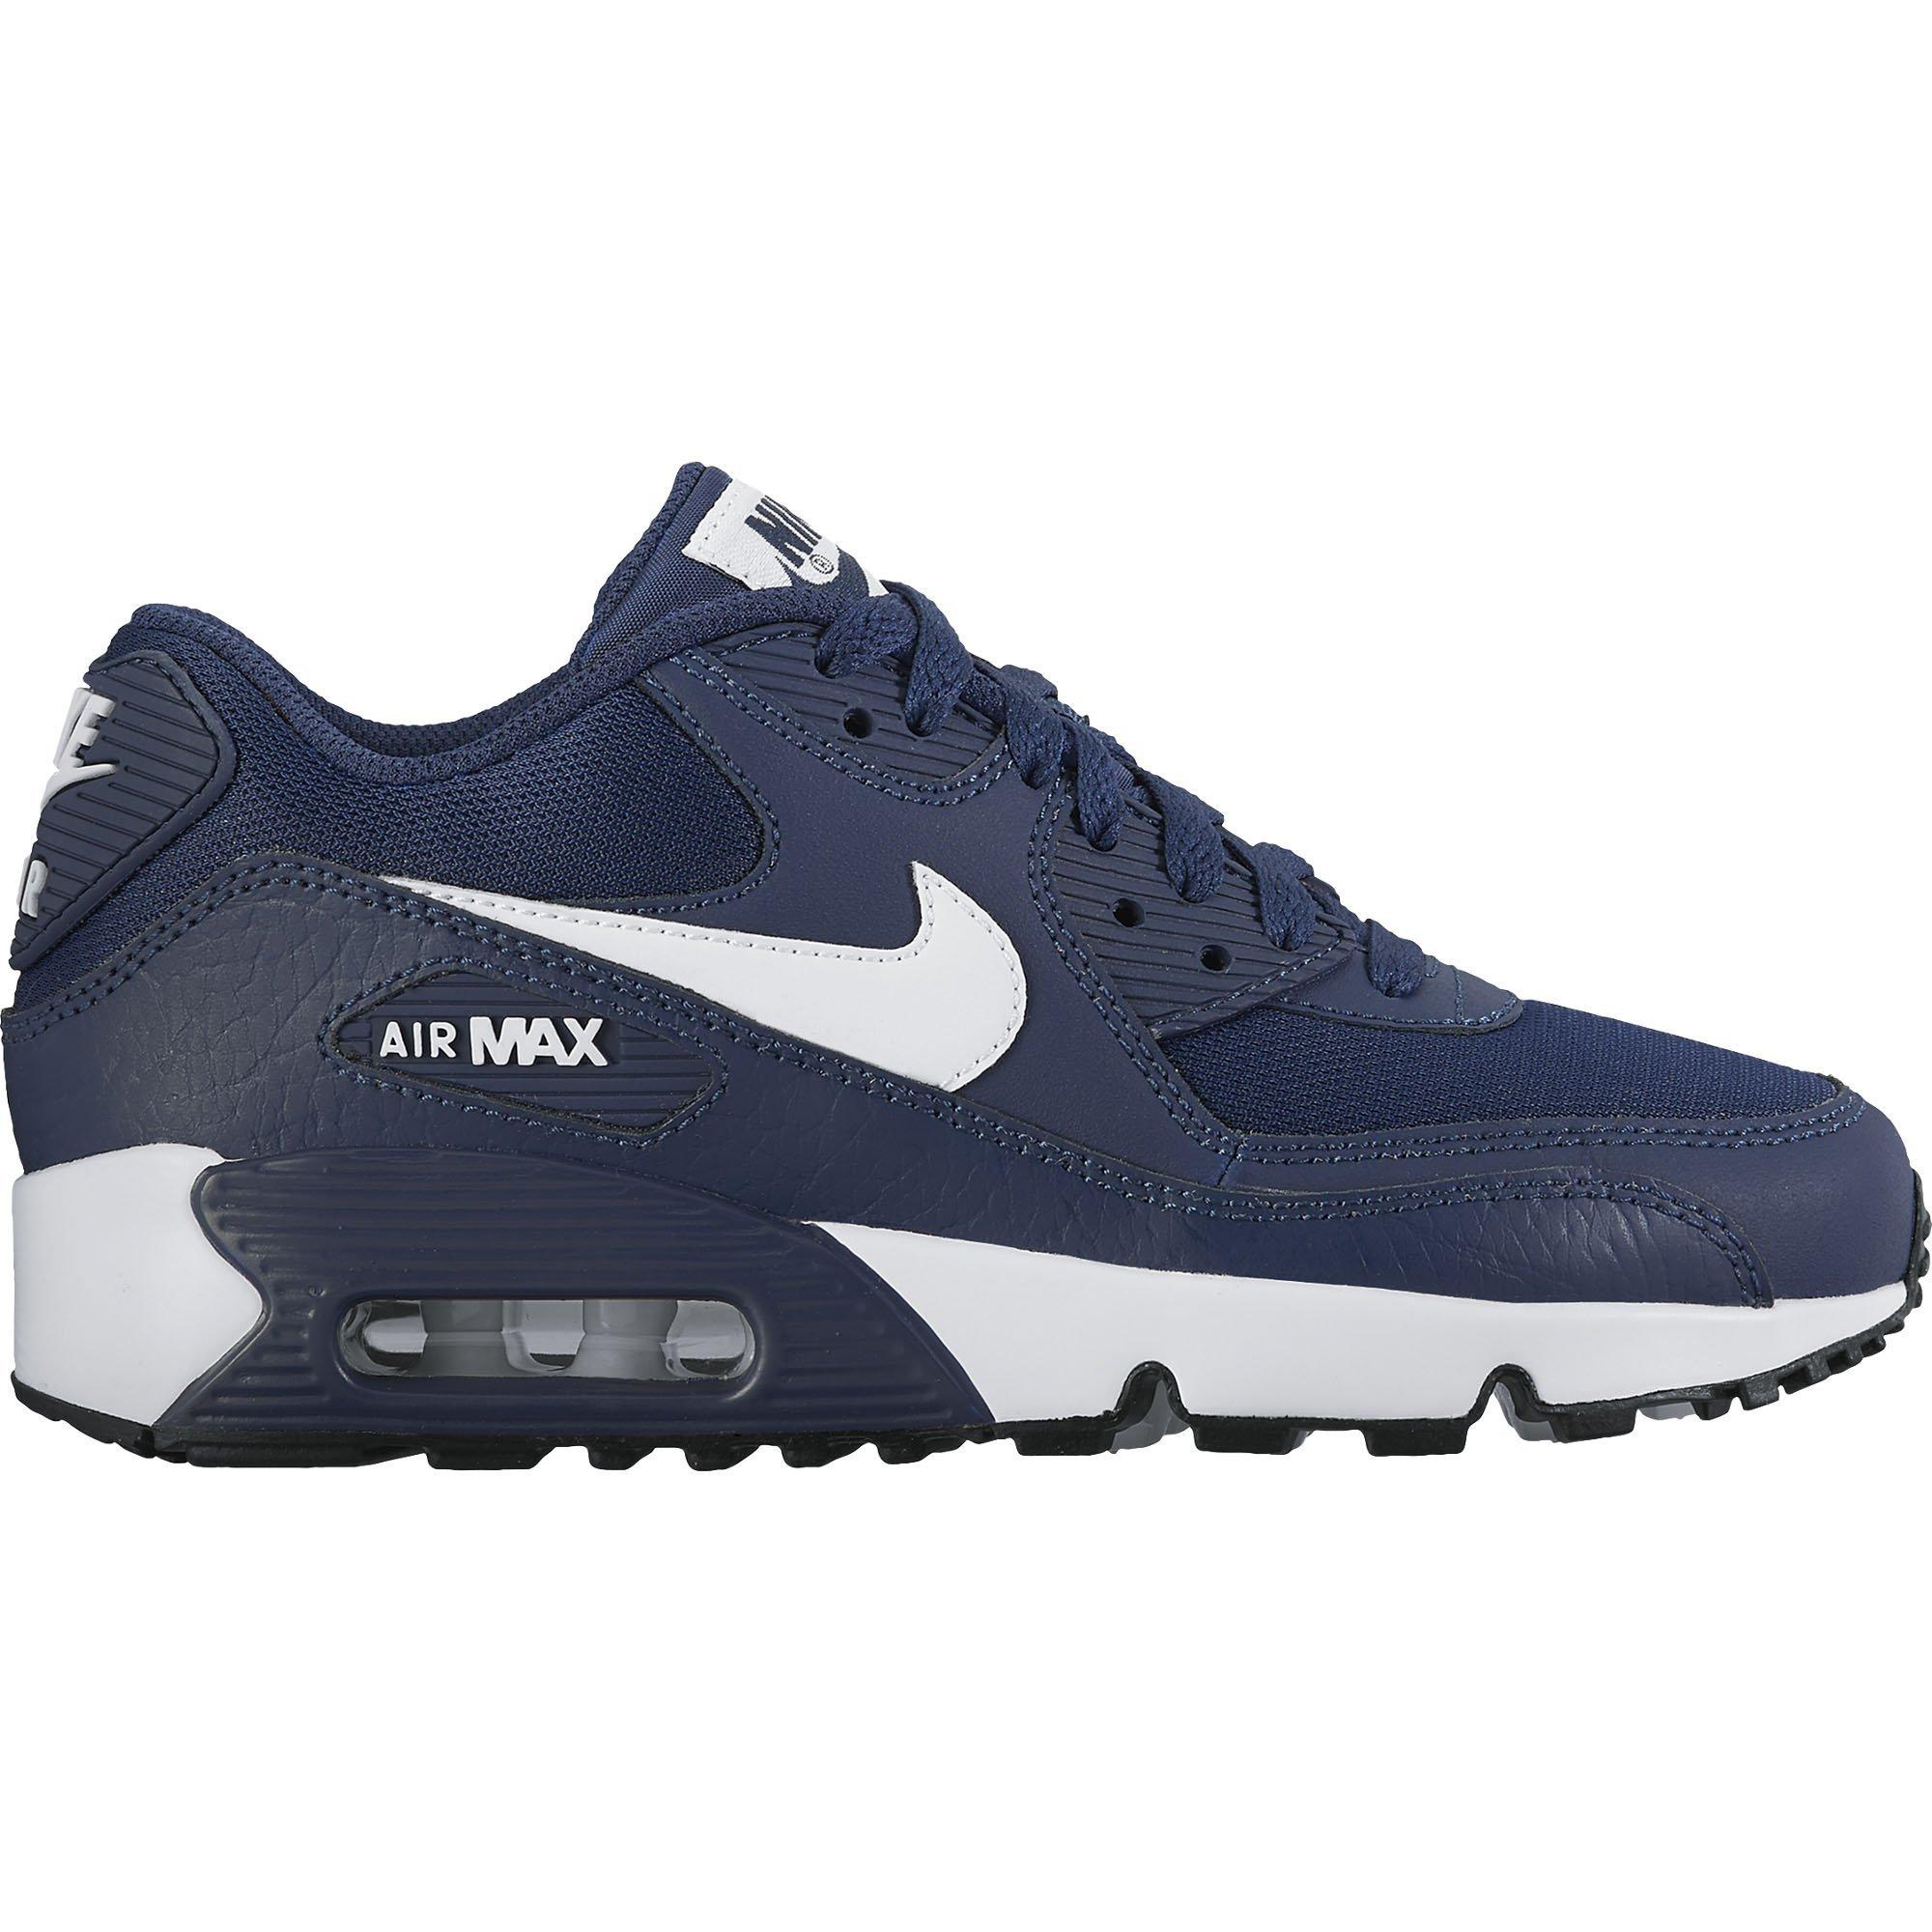 New Nike Boy's Air Max 90 Mesh Sneaker Navy/White 5 by NIKE